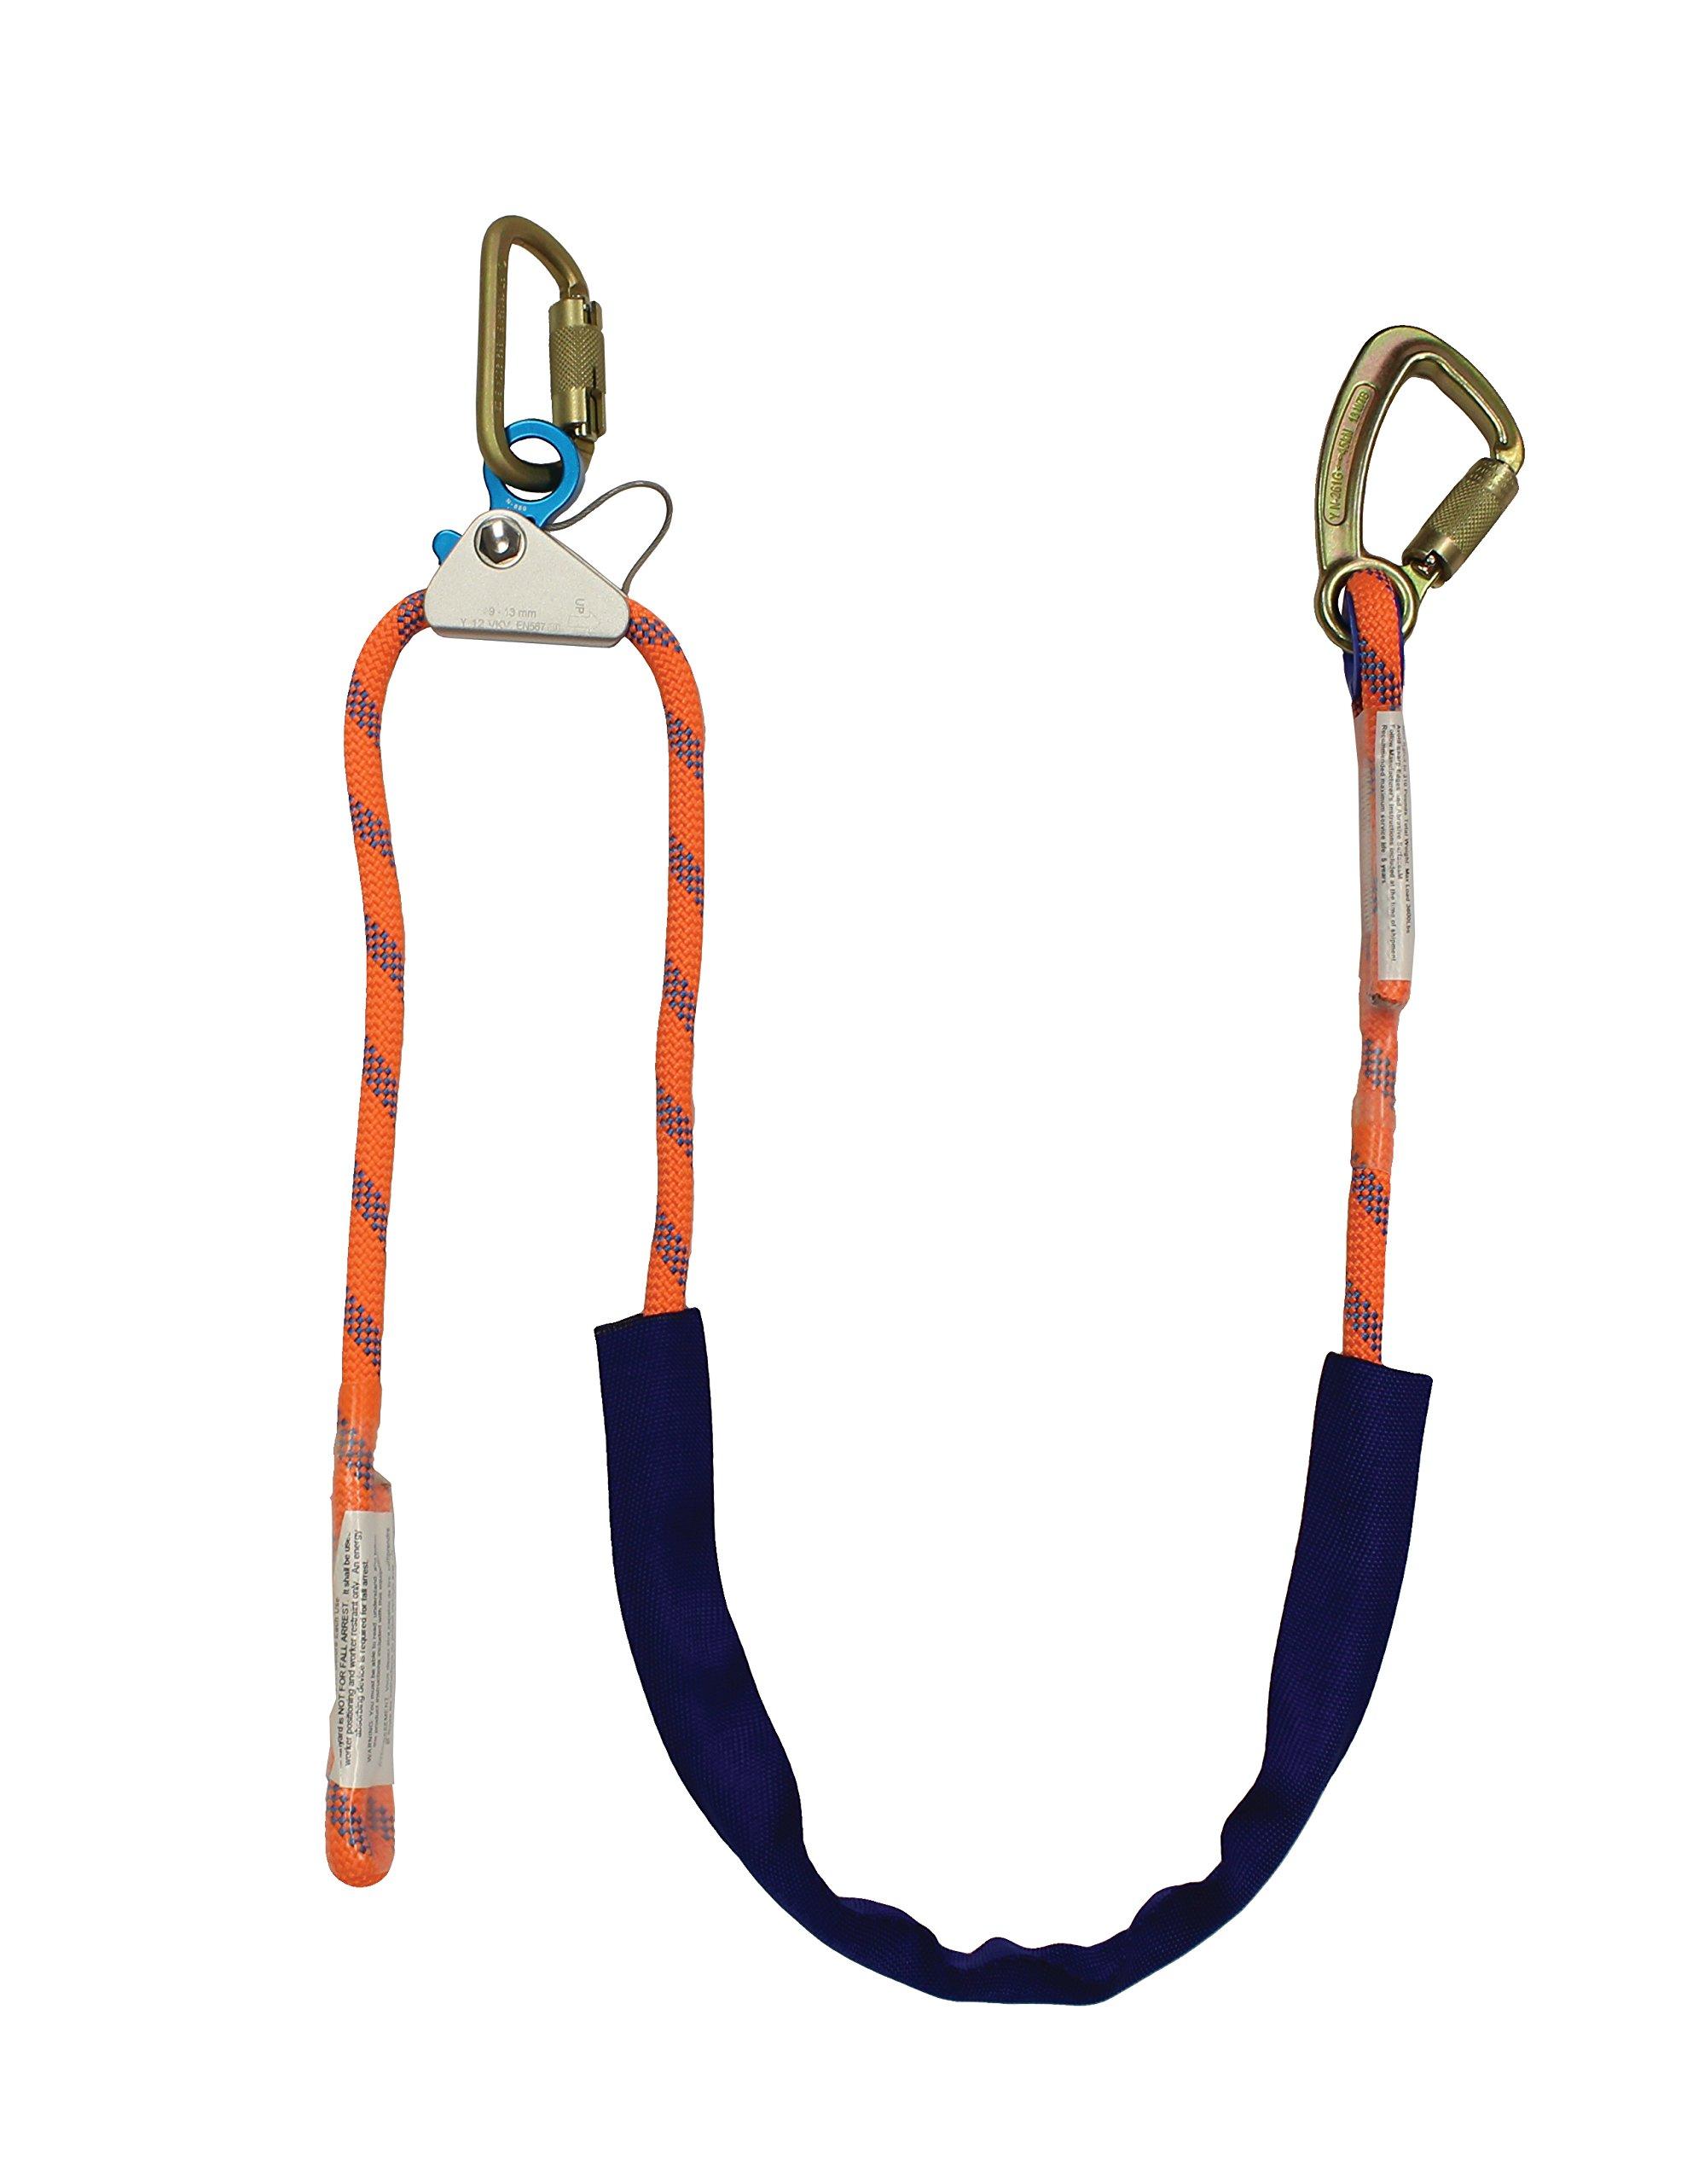 Elk River 34496 1/2'' by 6' Quick Adjustable Rope Positioning Lanyard by Elk River